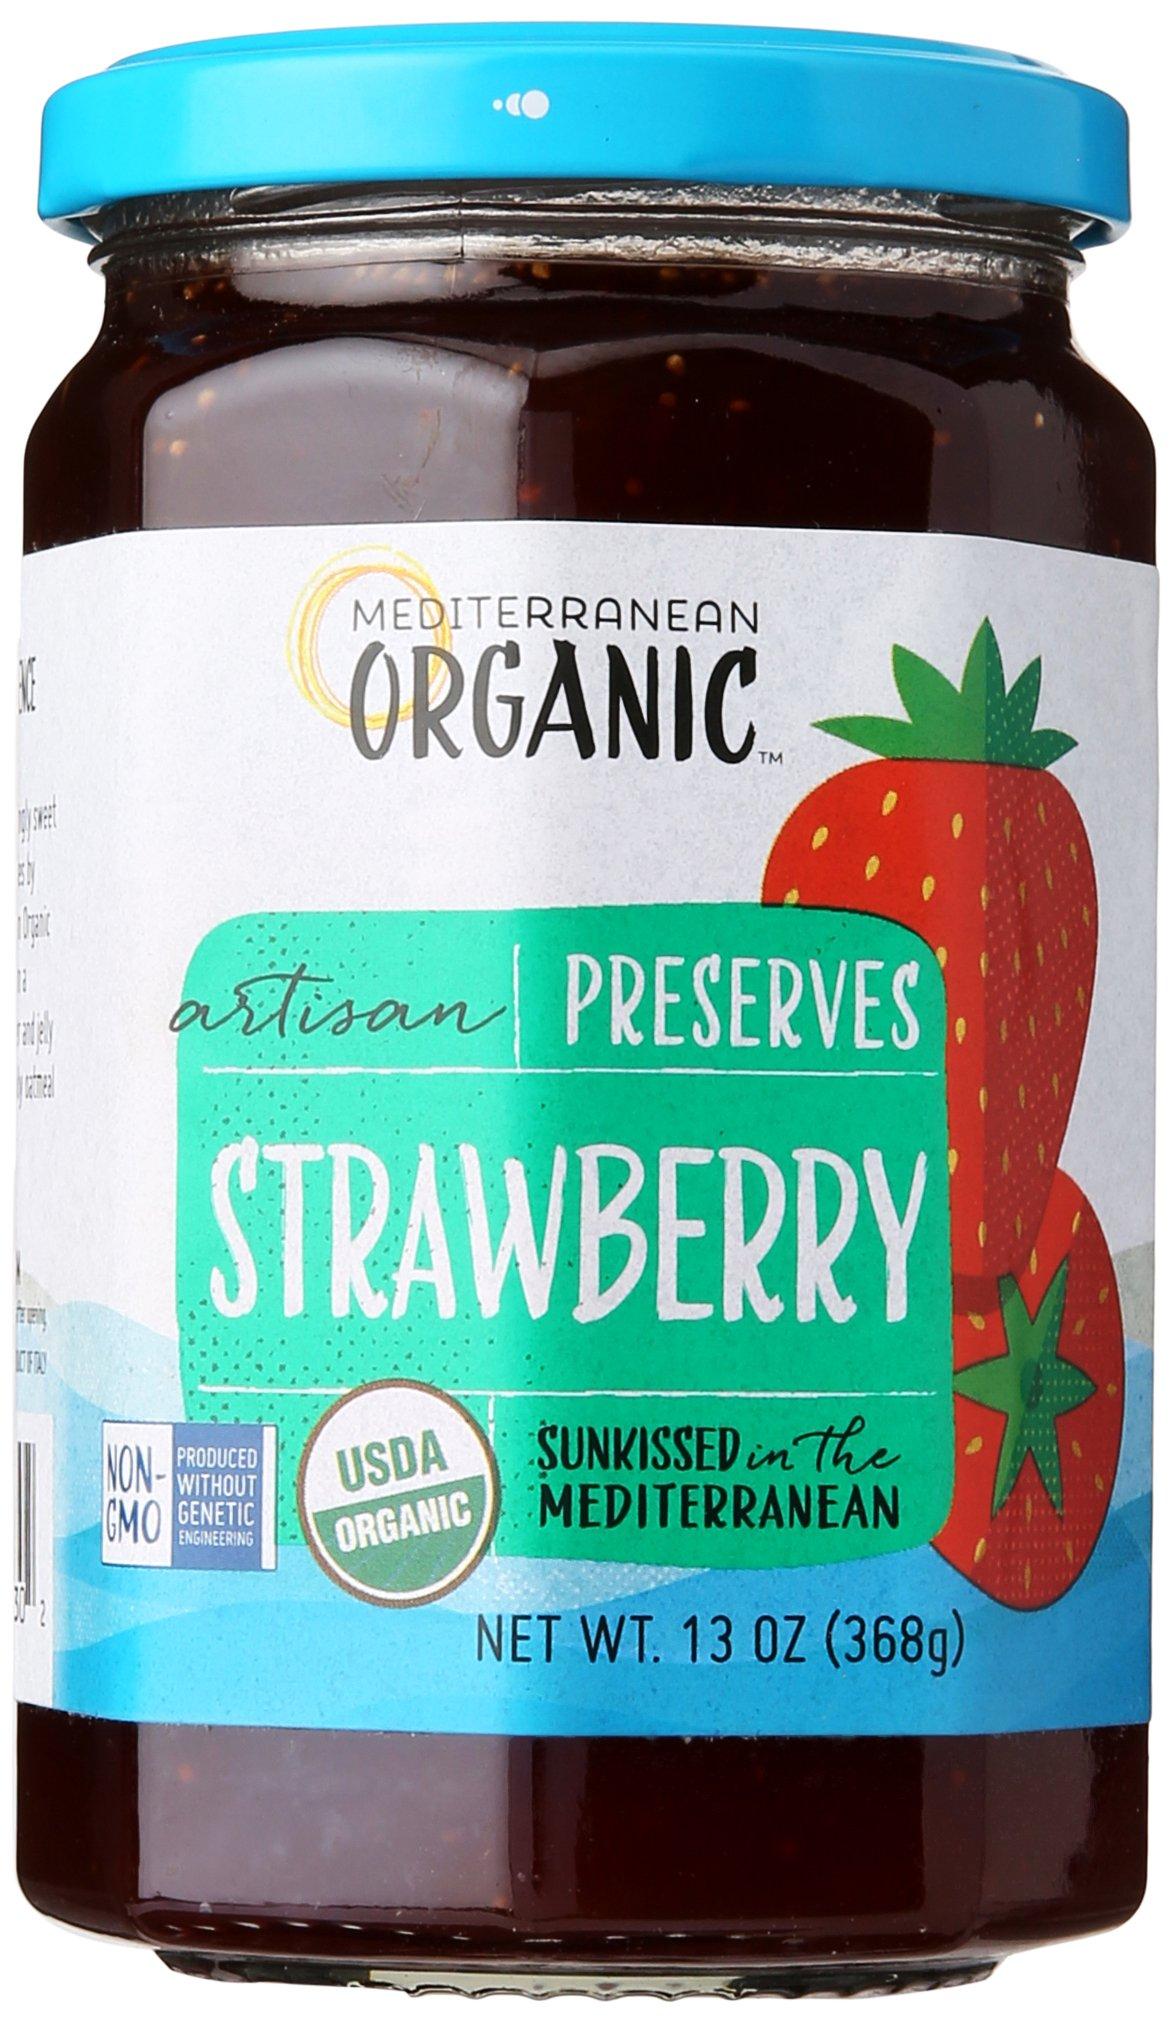 Mediterranean Organics Preserve Strawberry, 13 oz